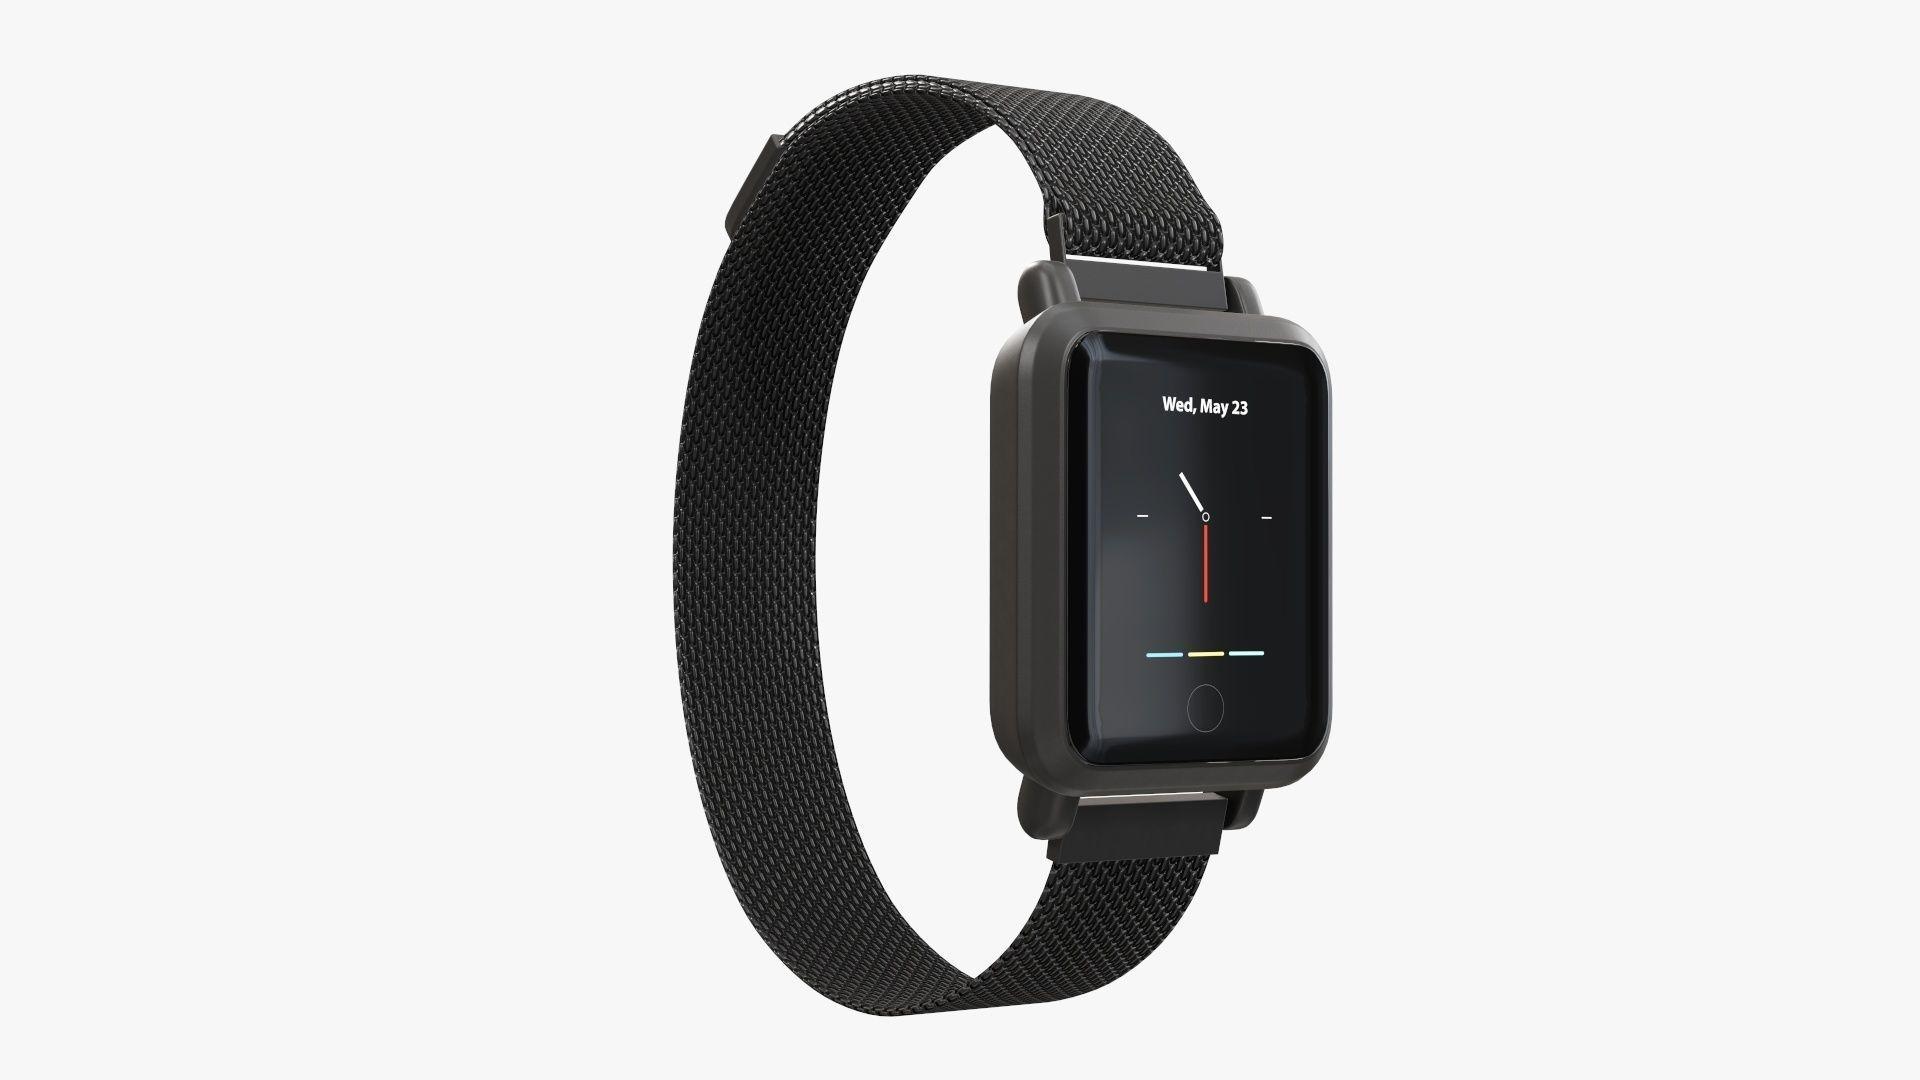 Smart watch 02 closed